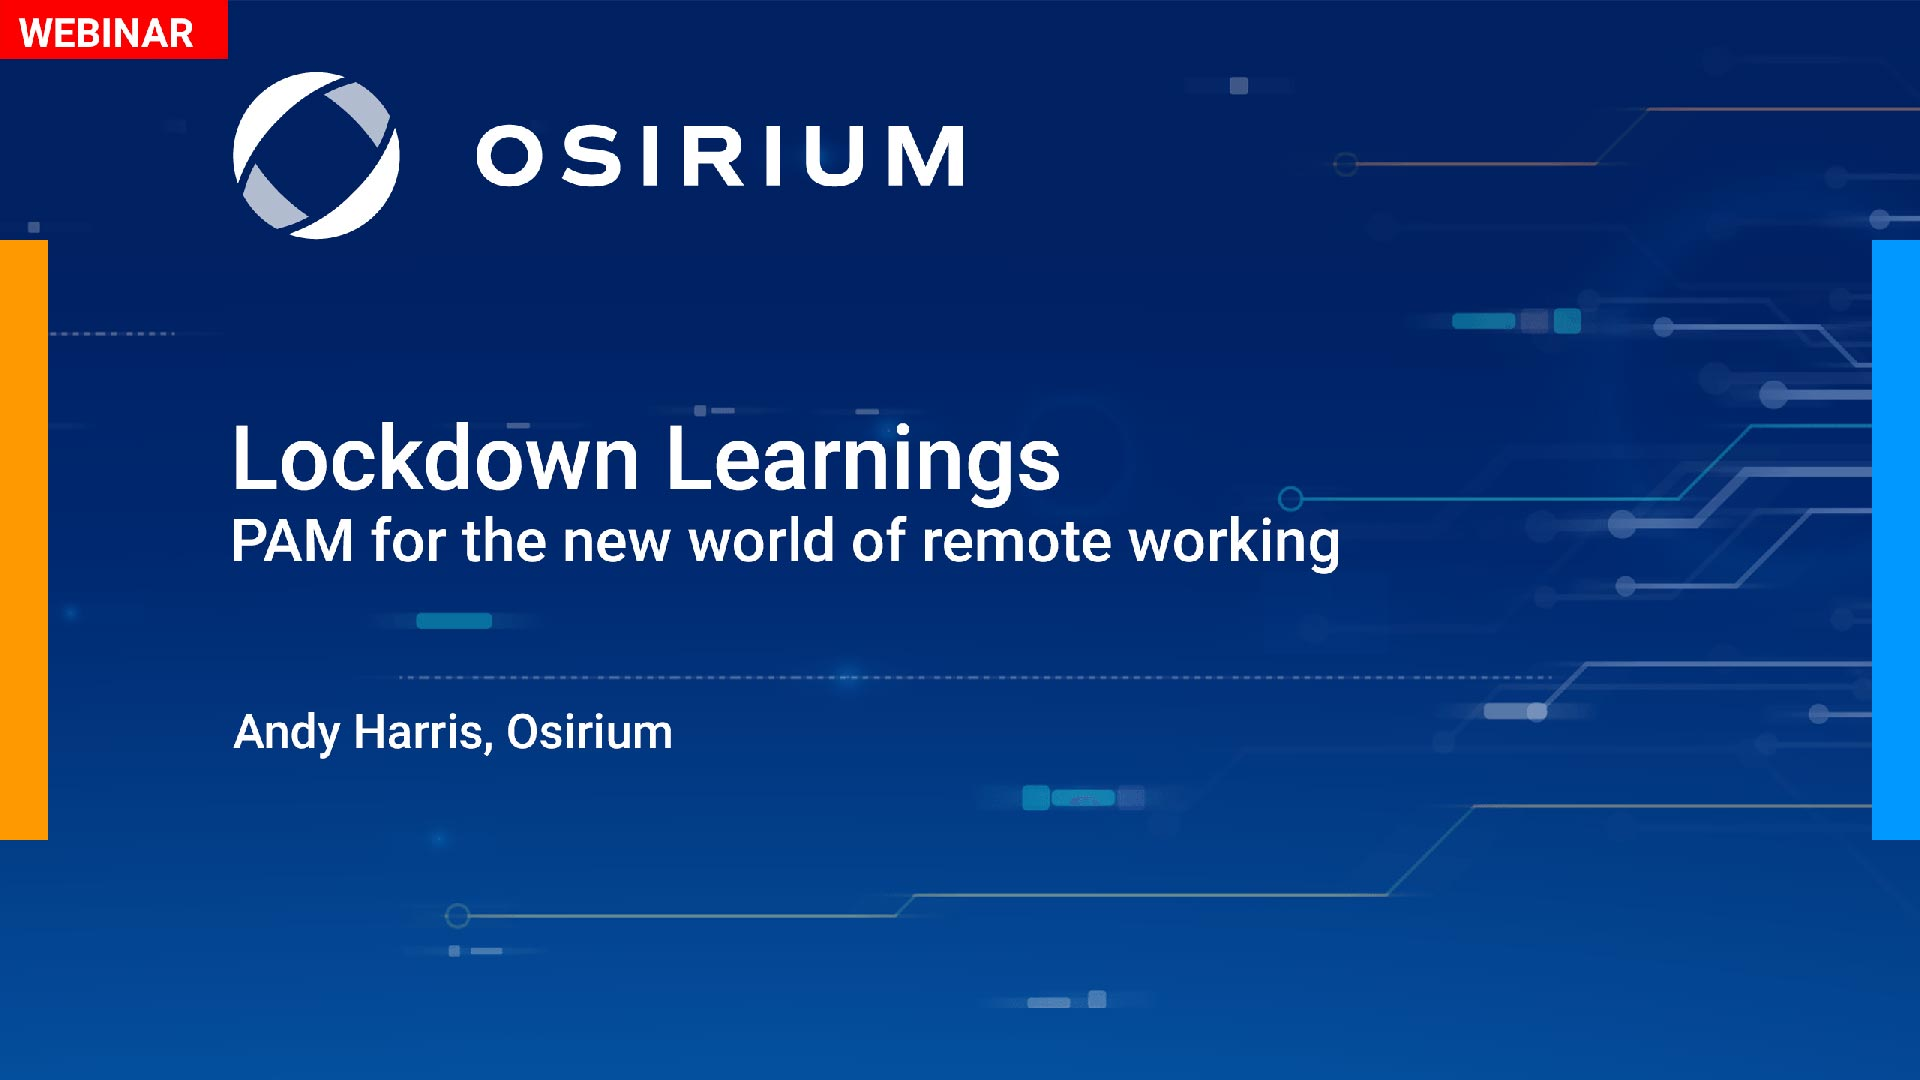 Lockdown Learnings